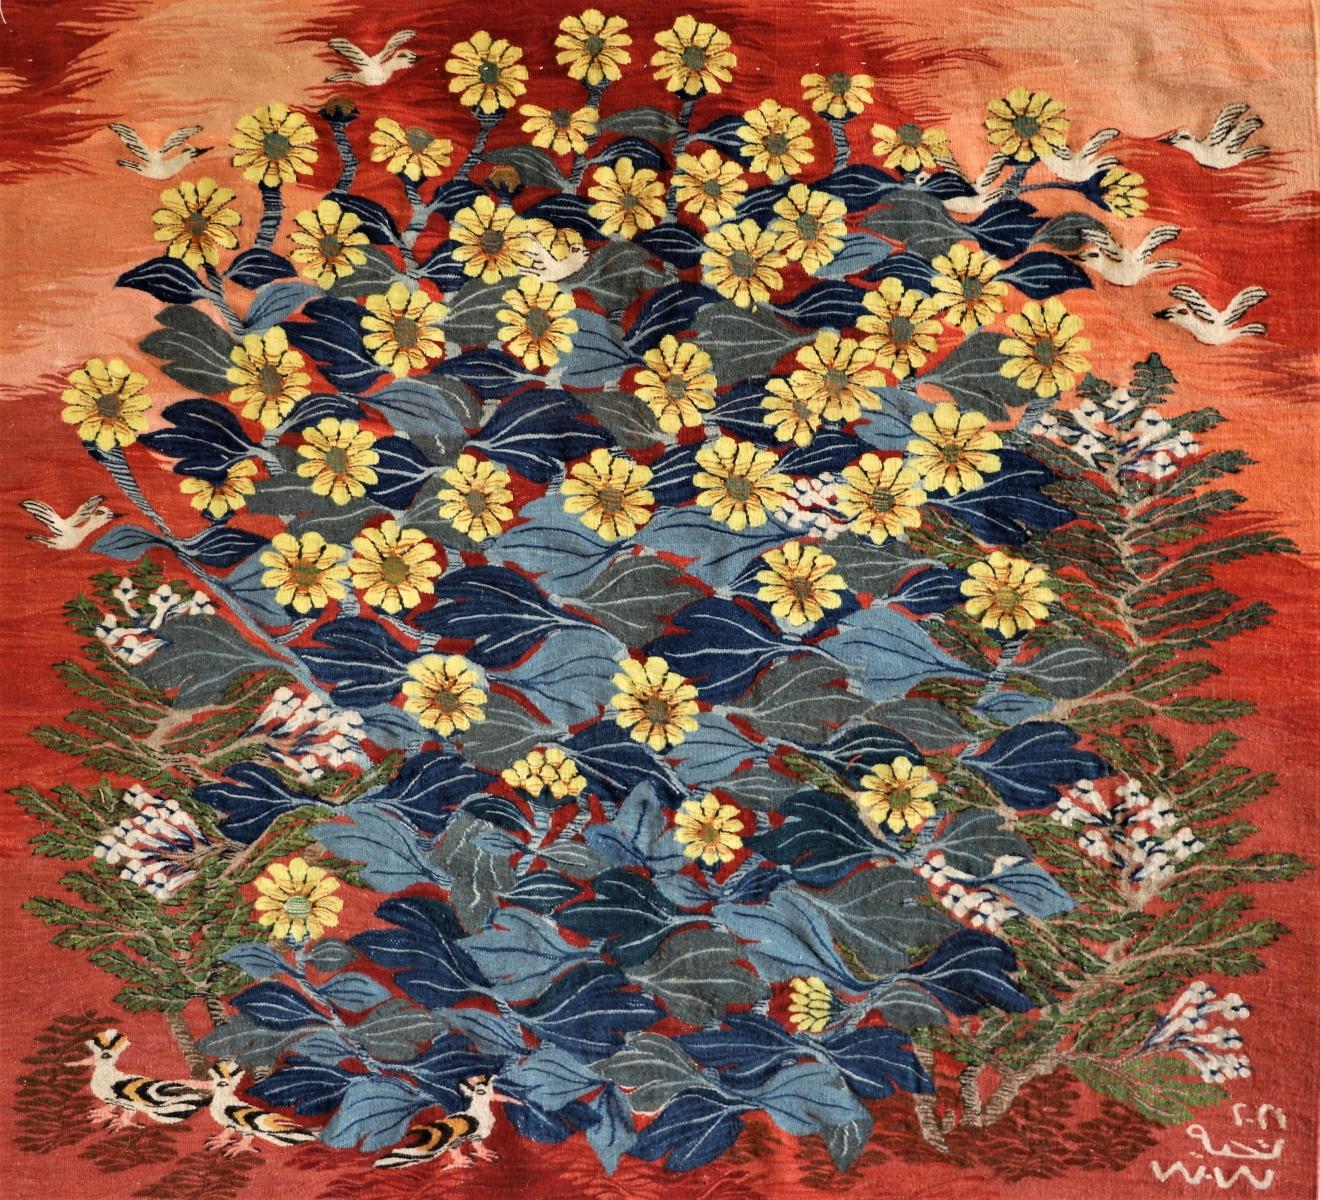 25-Spring-flowers-2021-119-1.25-x-1.17-m-Taheya-Ibrahim-2